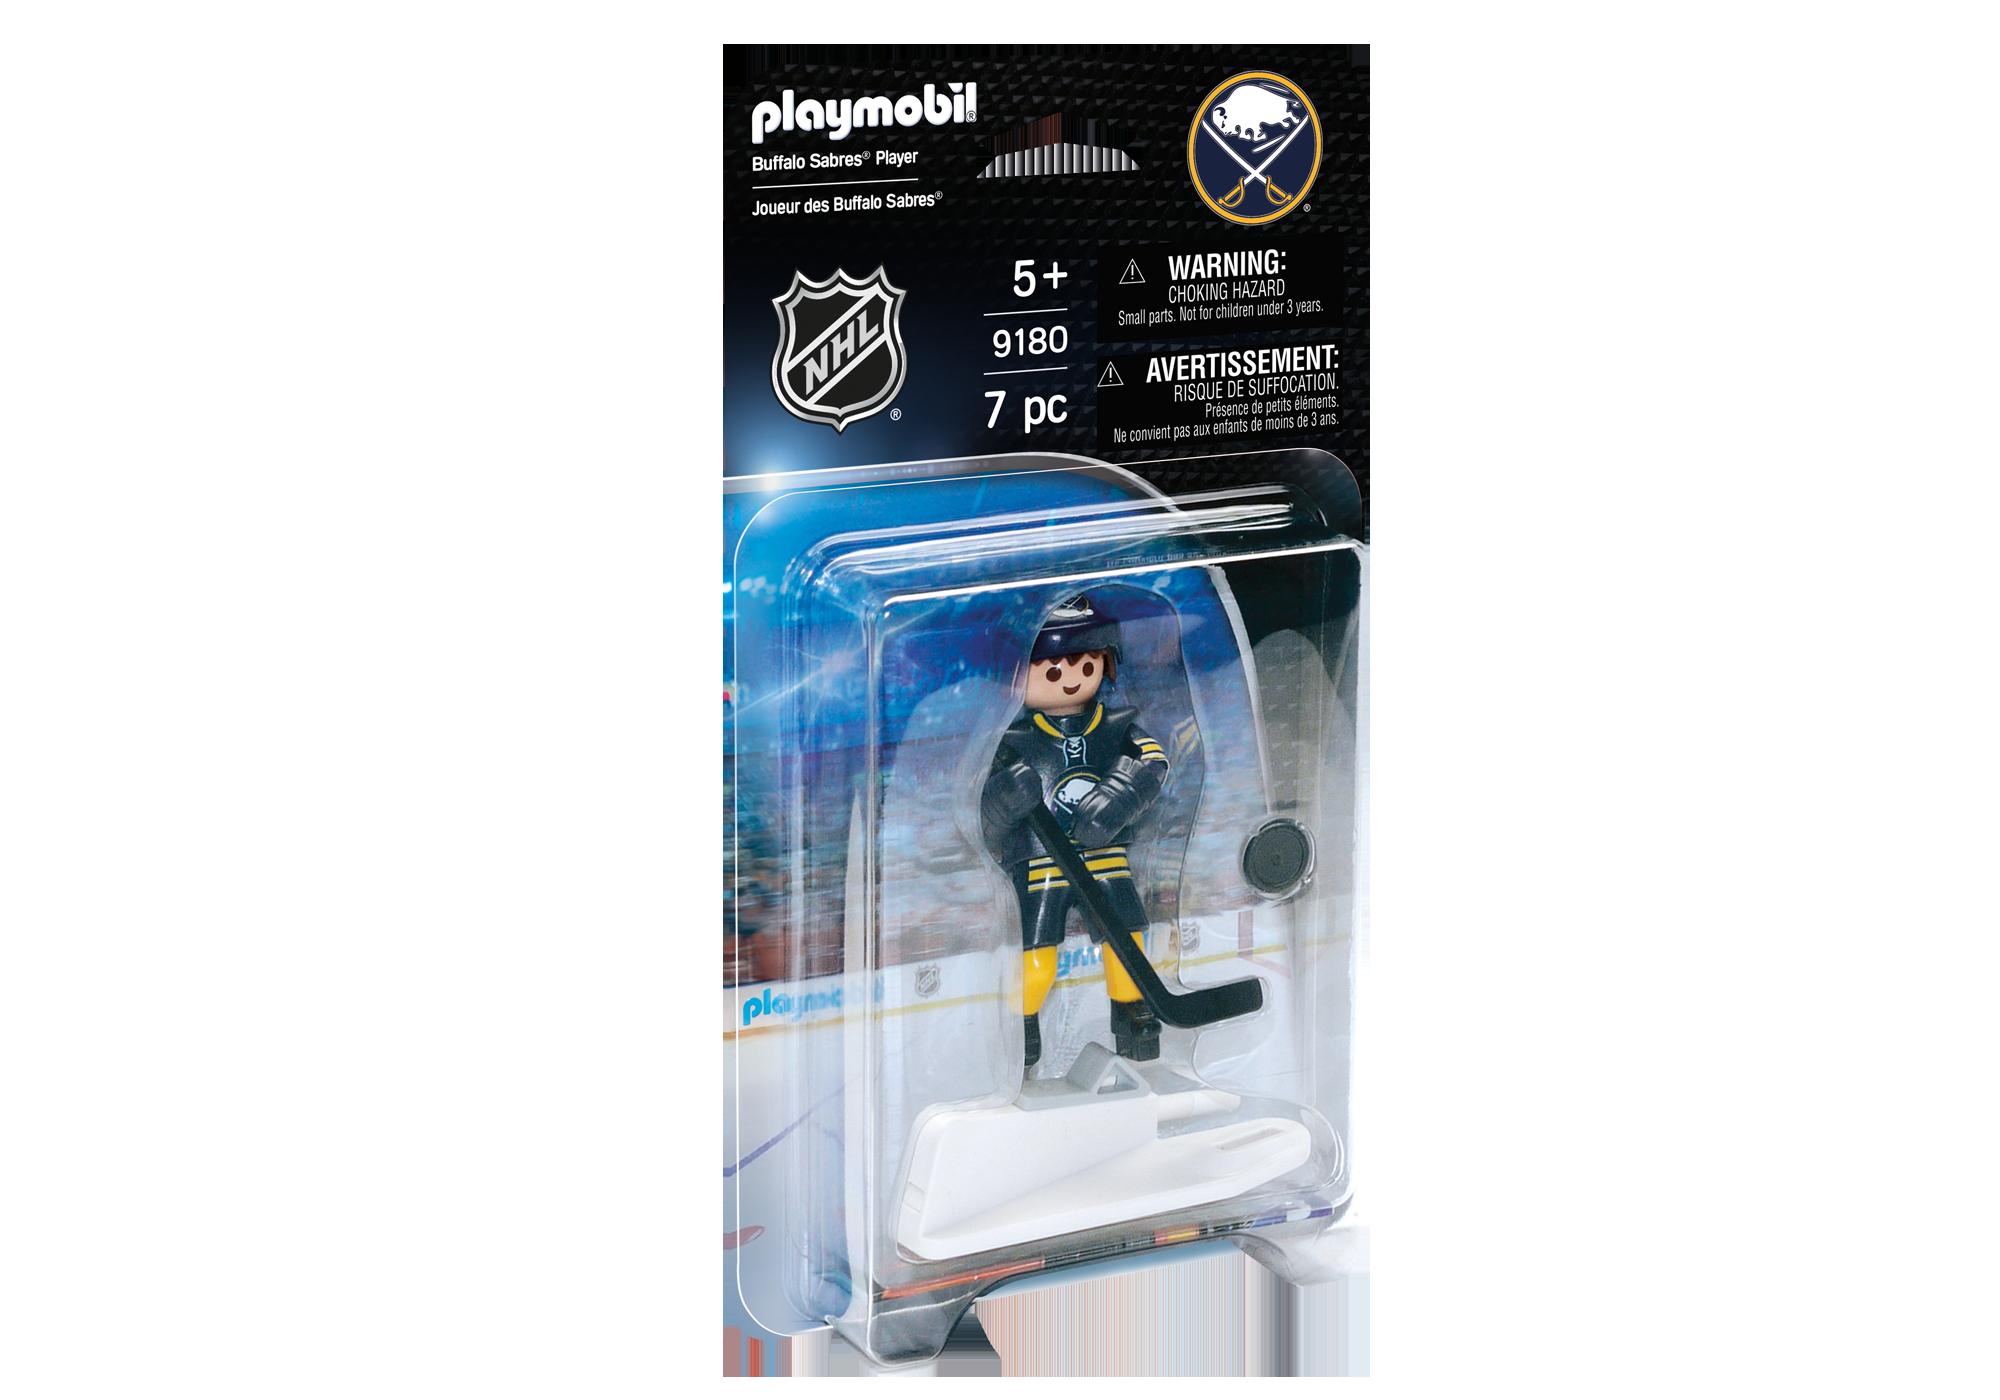 http://media.playmobil.com/i/playmobil/9180_product_box_front/NHL® Buffalo Sabres® Player